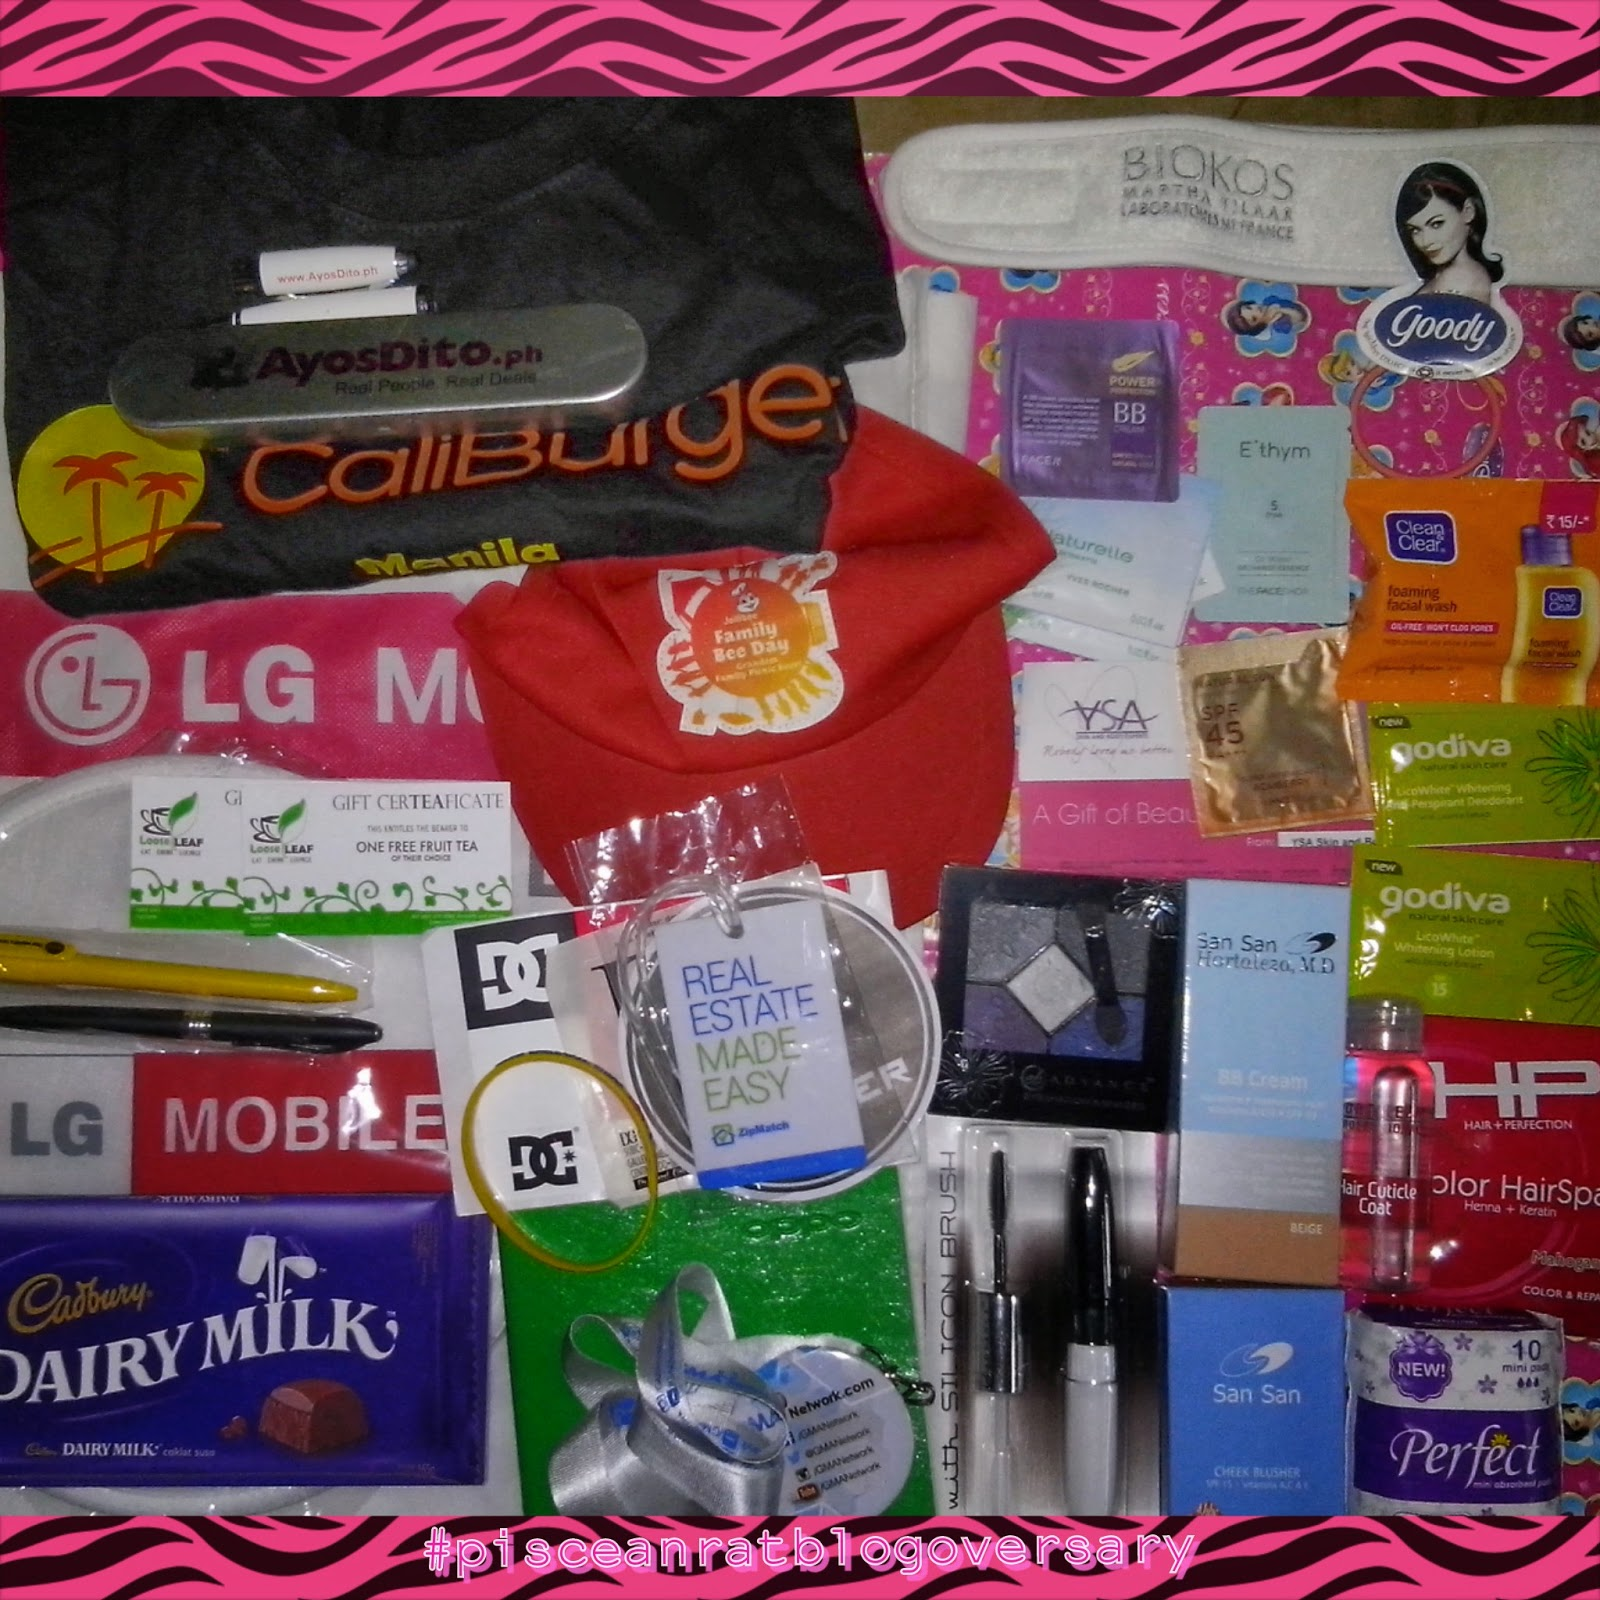 pisceanrat, blogversary, giveaway, philippines